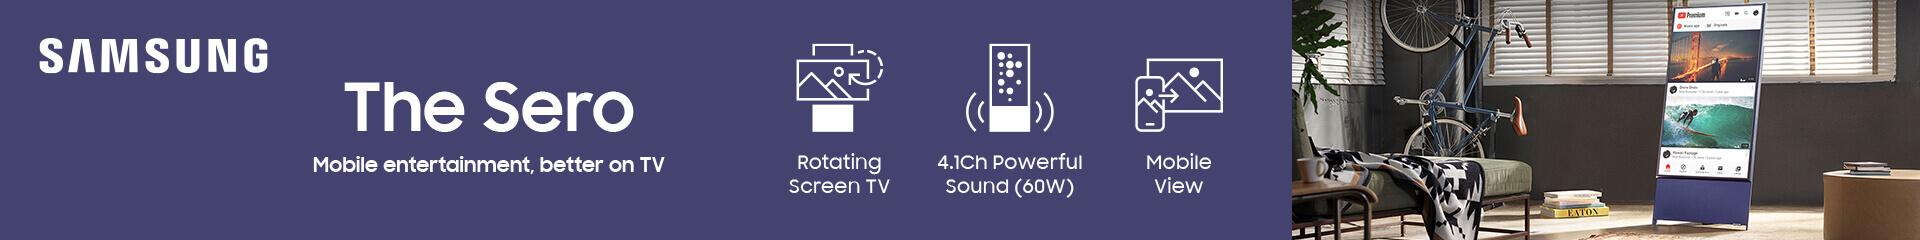 The Sero TV | Samsung